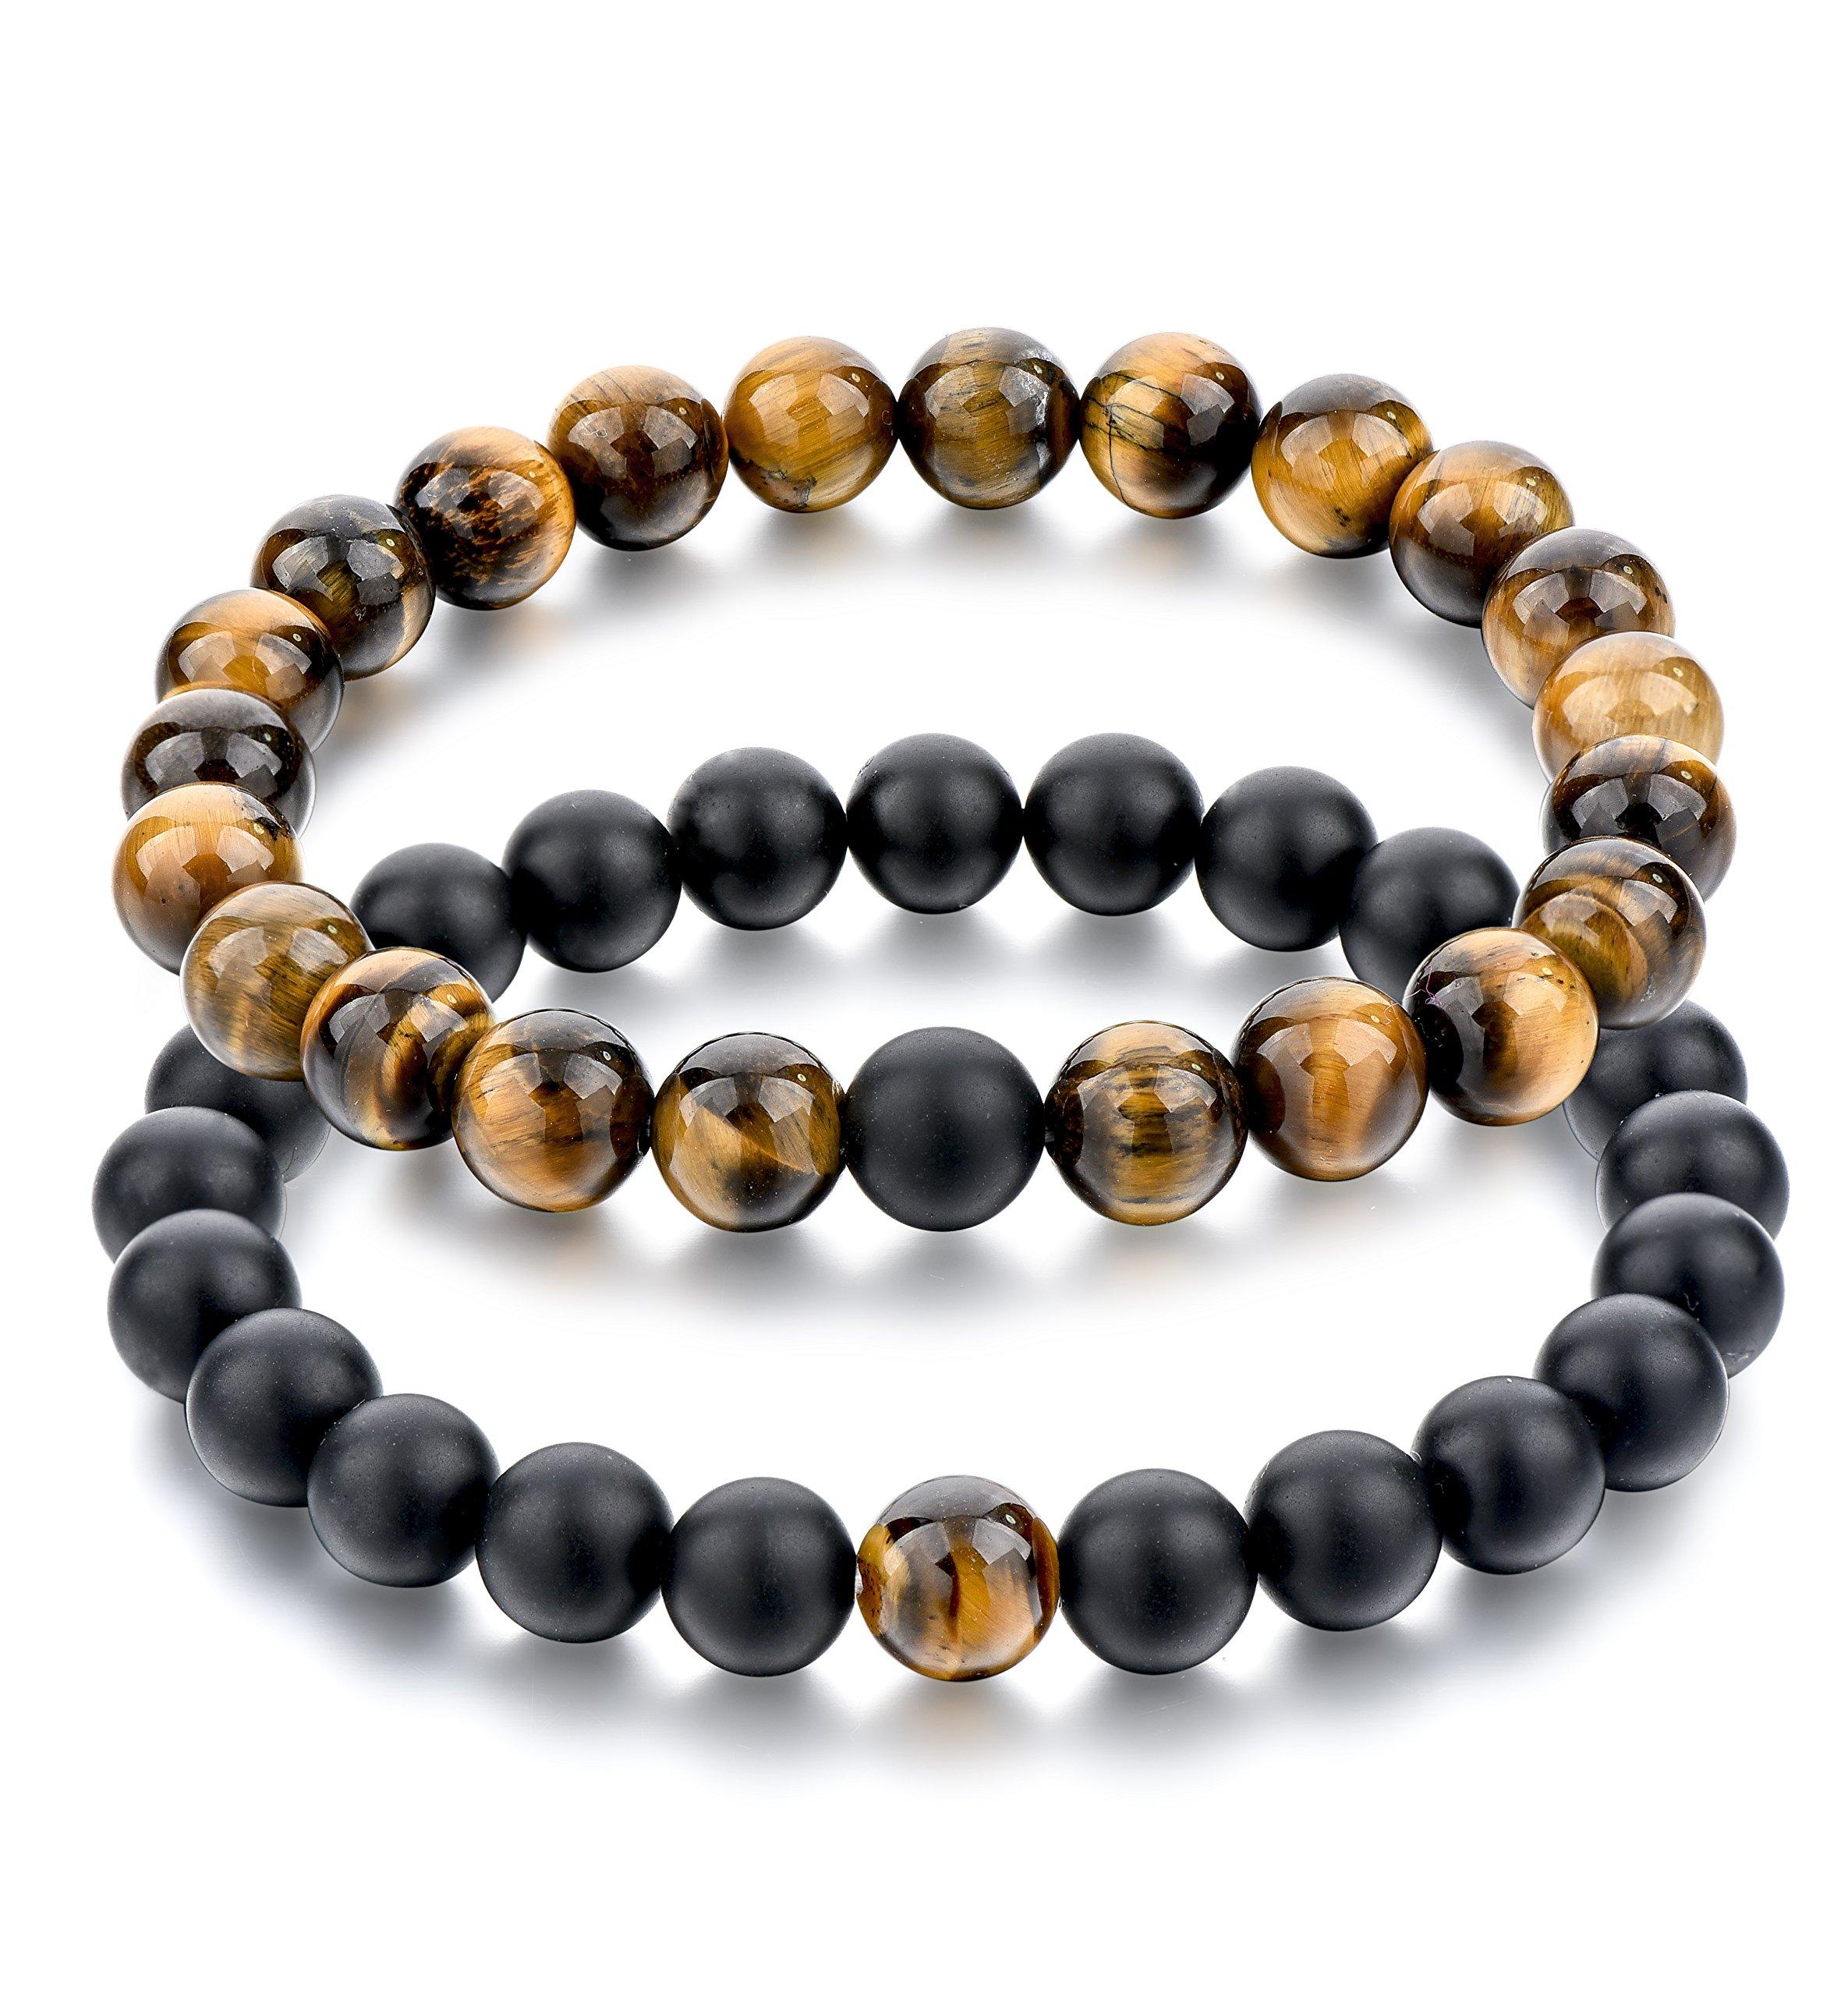 Long Way 2 pcs Black Matte Agate & Tiger Eye Gem Beads 8mm Double Matching Distance Bracelets 7.5''Z & 7.9''